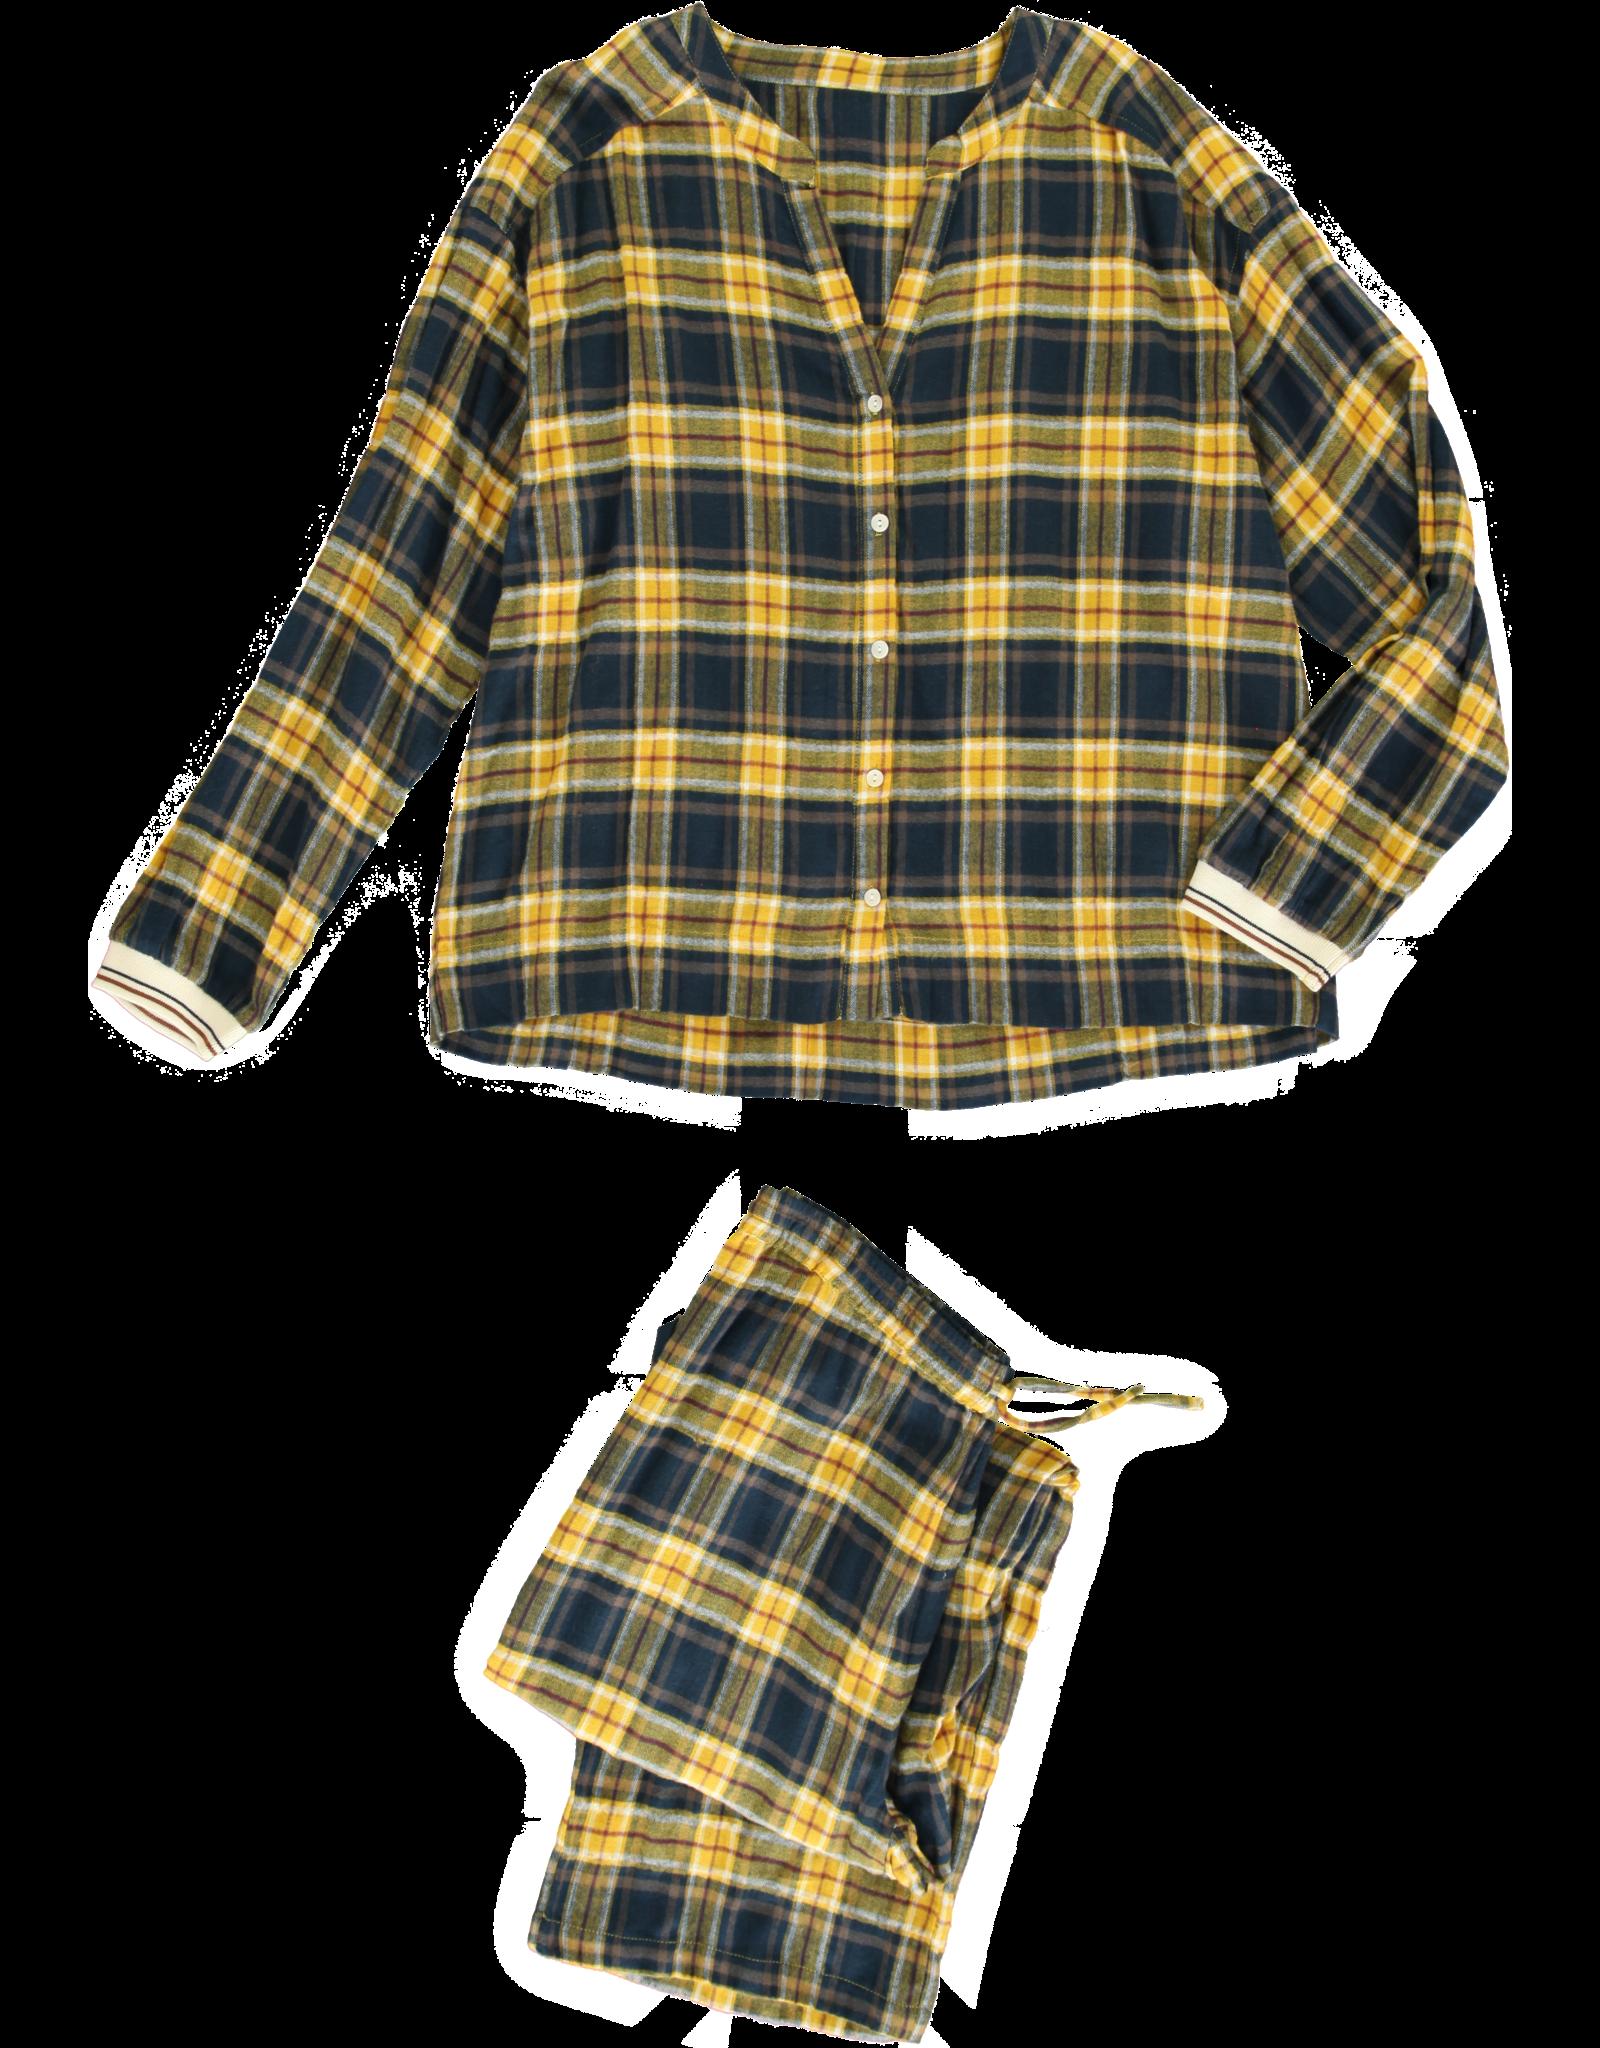 Dorélit Diane + Alkes   Pajama Set Woven   Check Navy